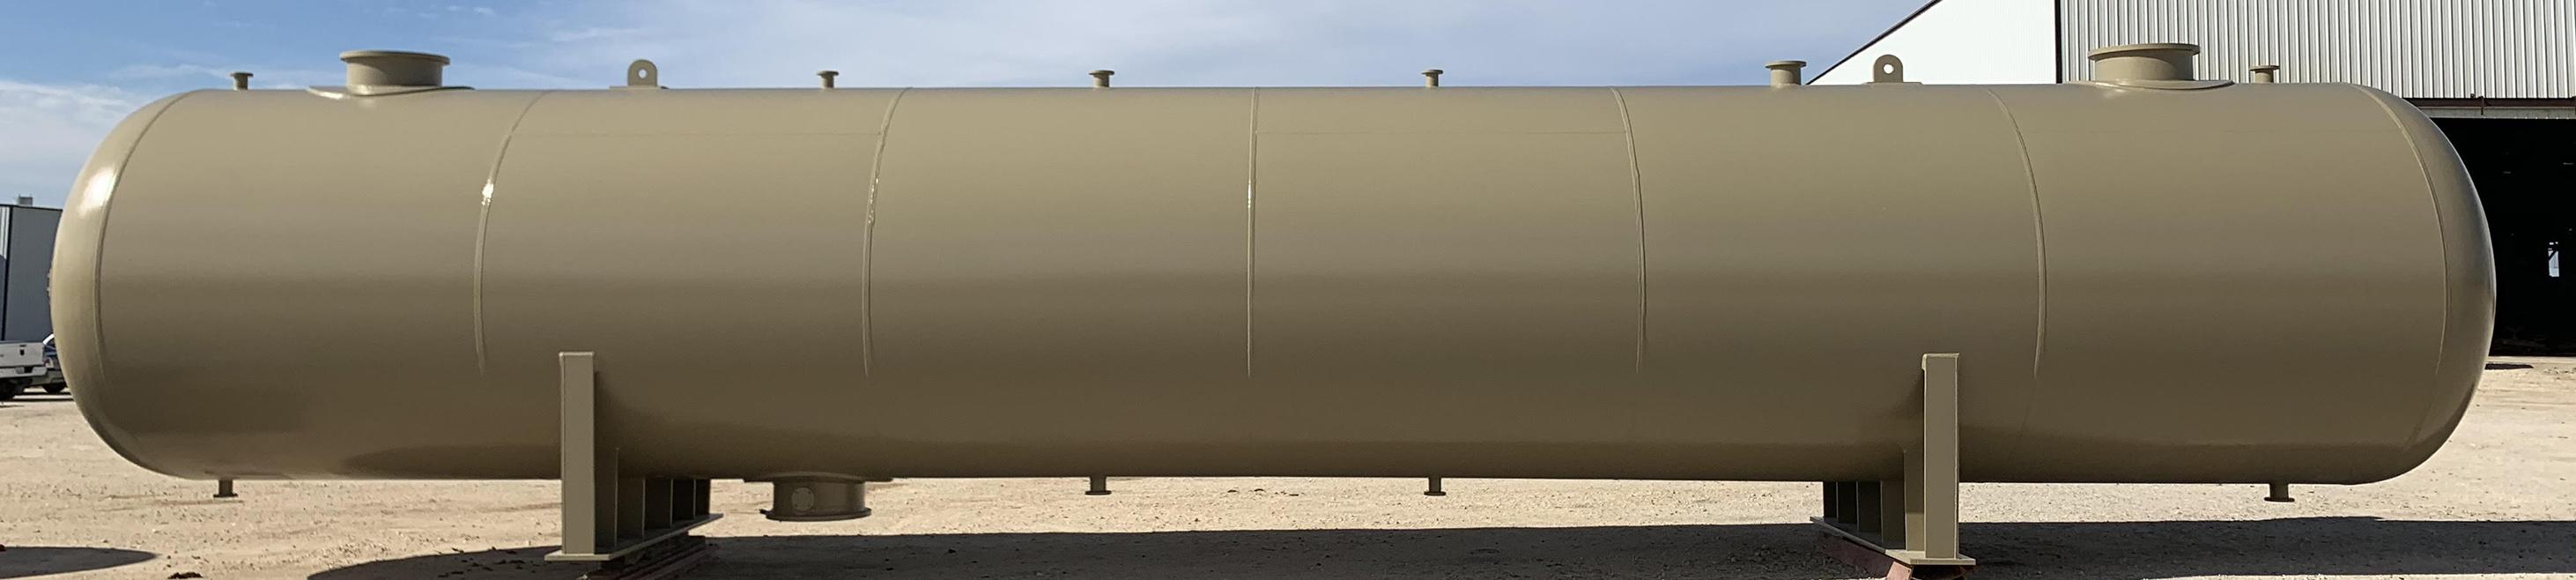 Horizontal Vessel-Type Slug Catcher - Engineering Design & Fabrication